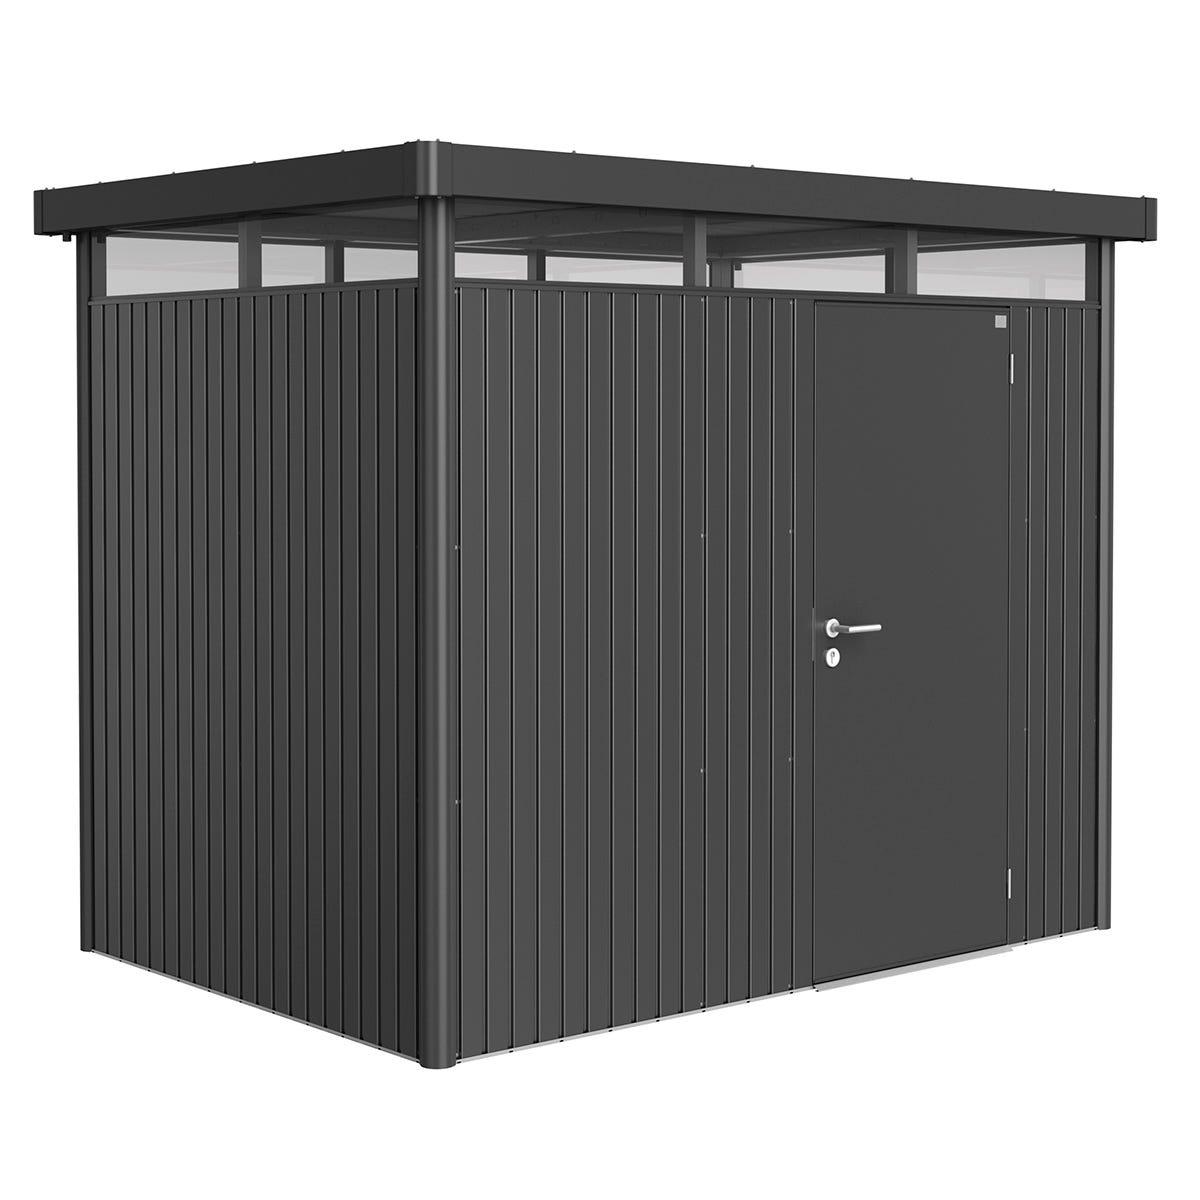 Biohort Highline Metal Shed H2 Standard door 9 x 6 - Dark Grey